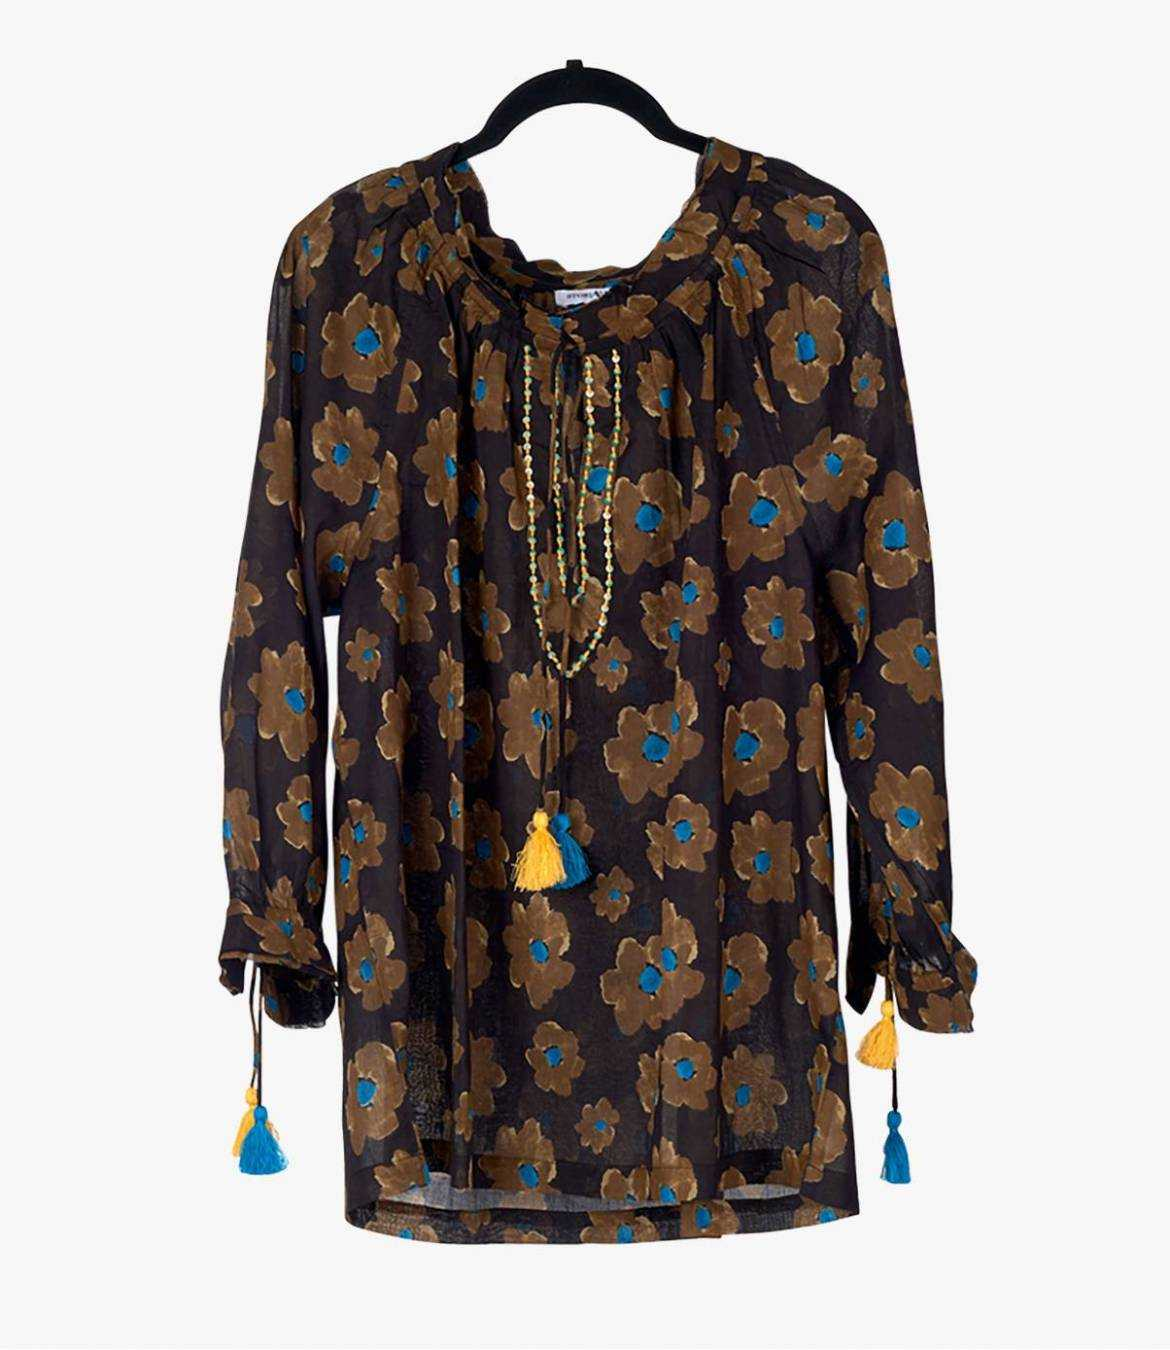 BETI ASTER Cotton Blouse for Women Storiatipic - 2